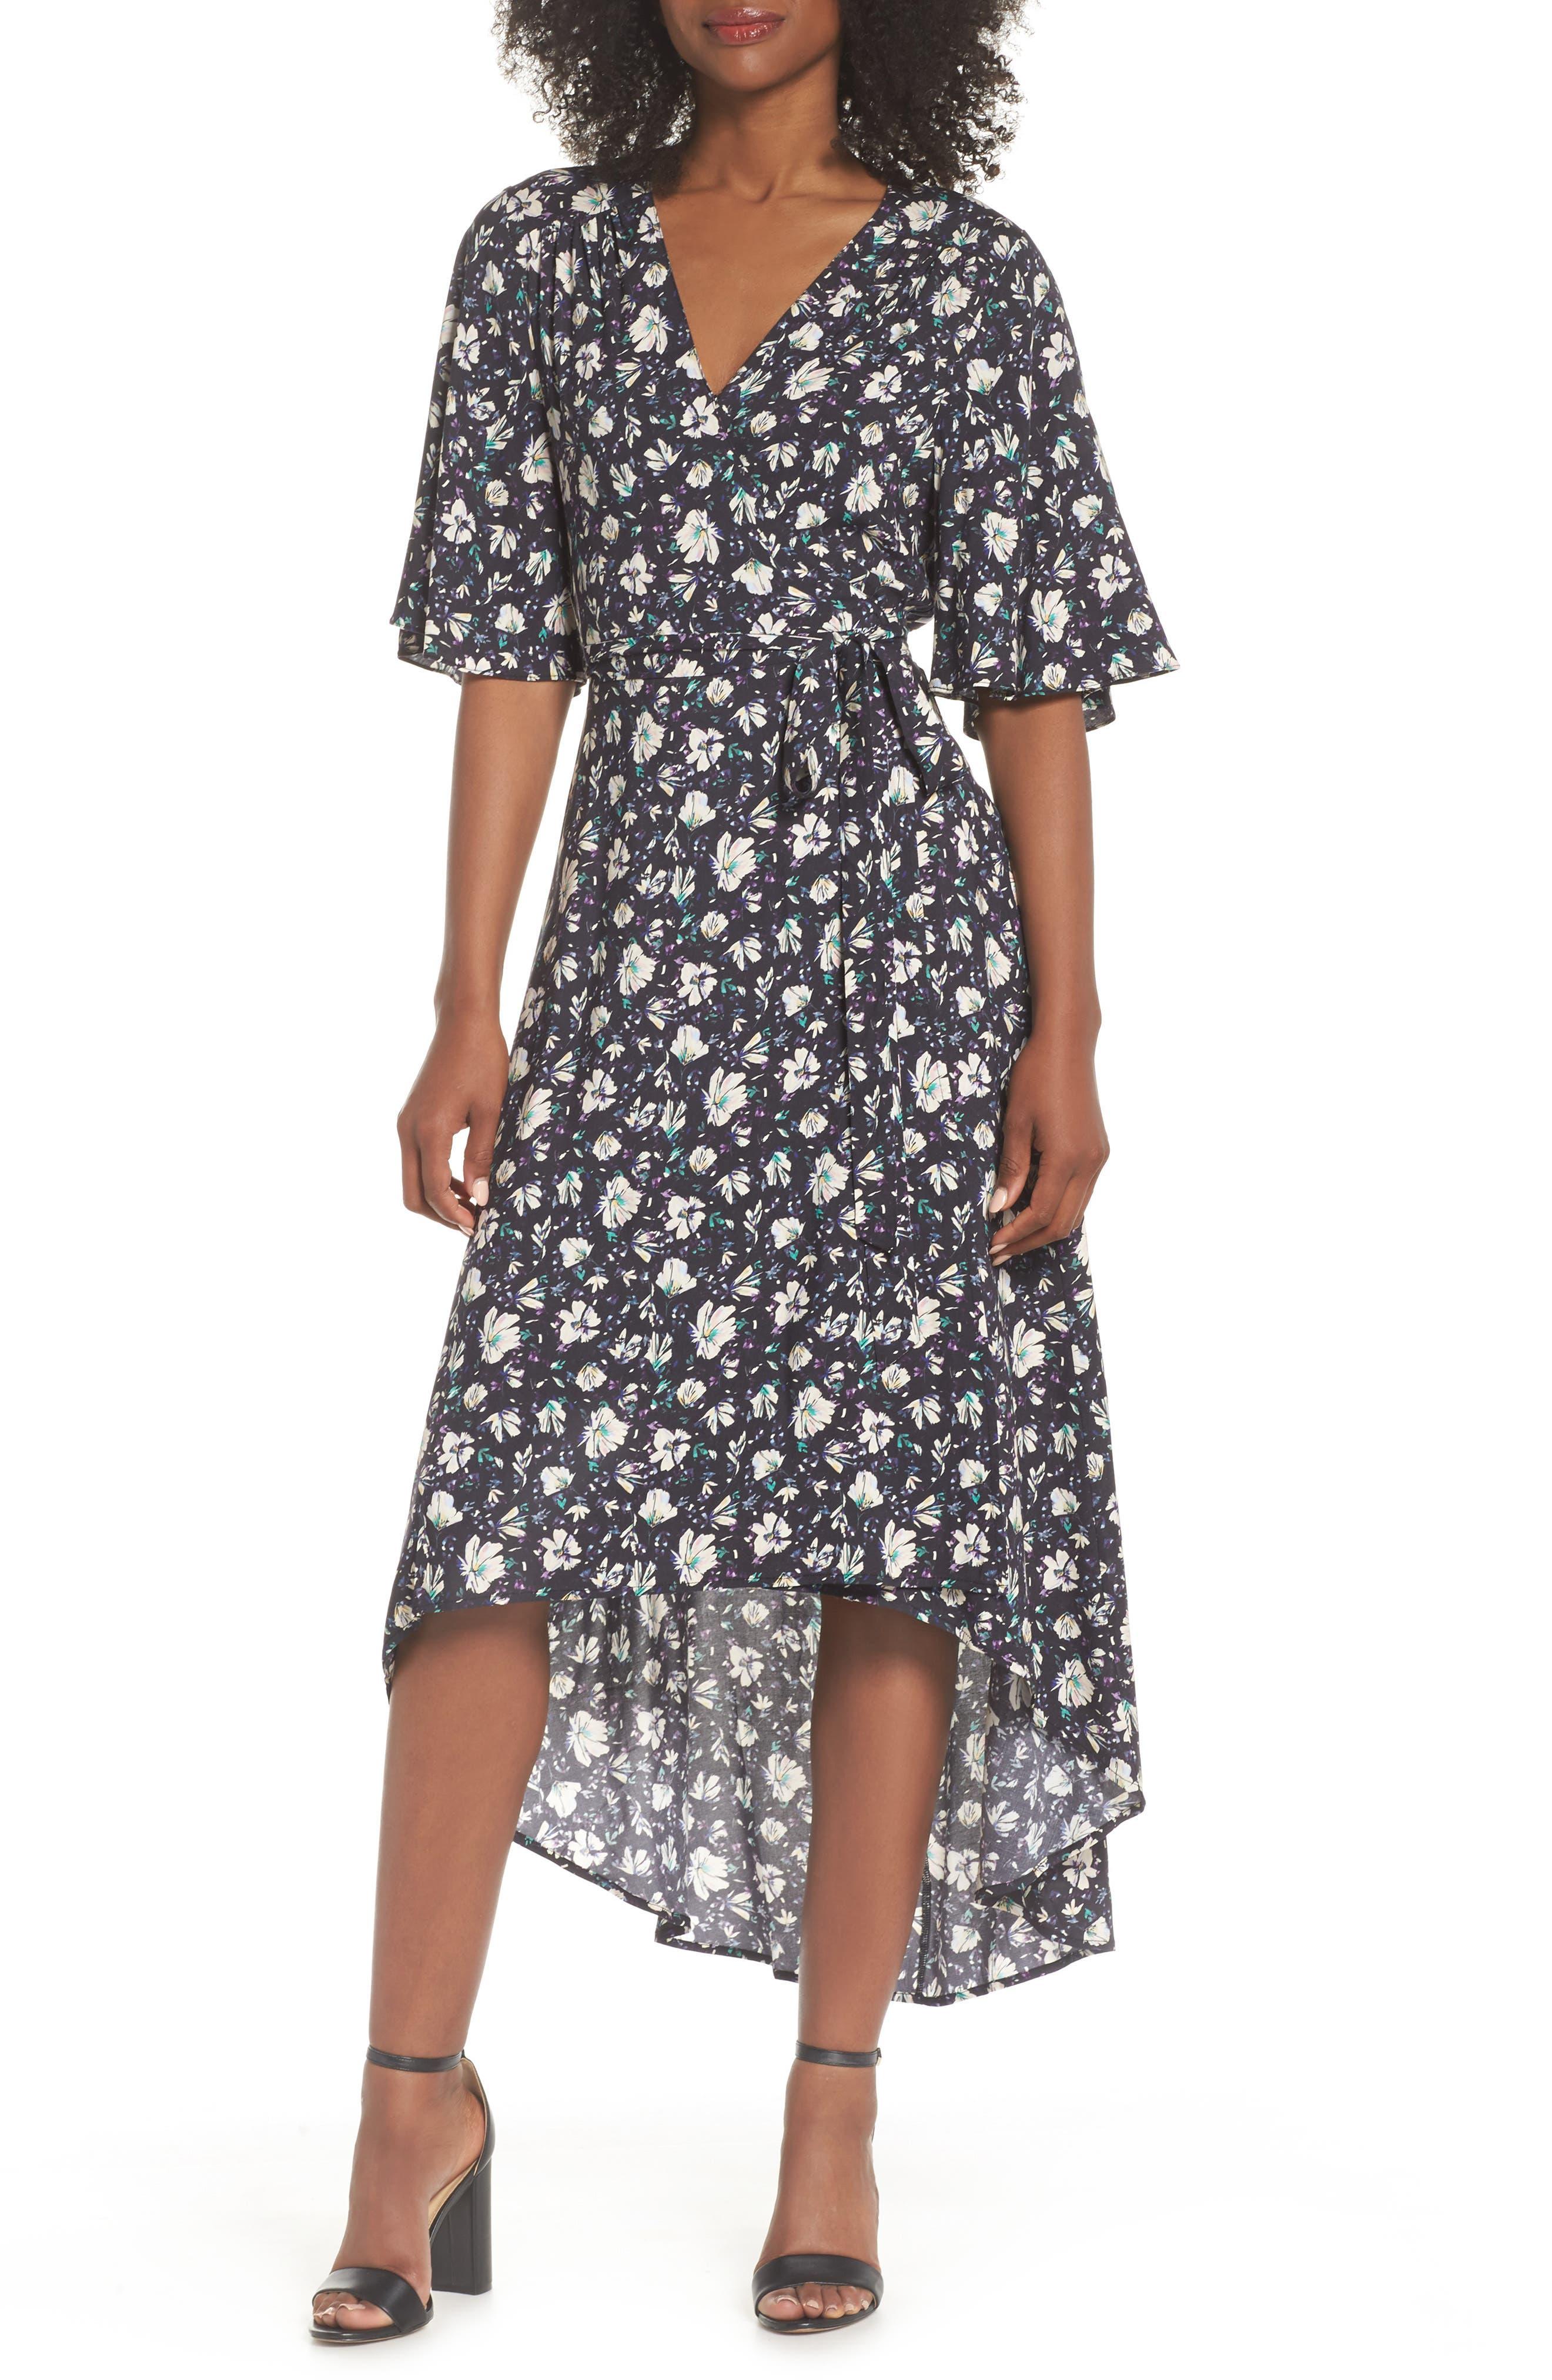 Felicity & Coco Lonny Floral Wrap Dress